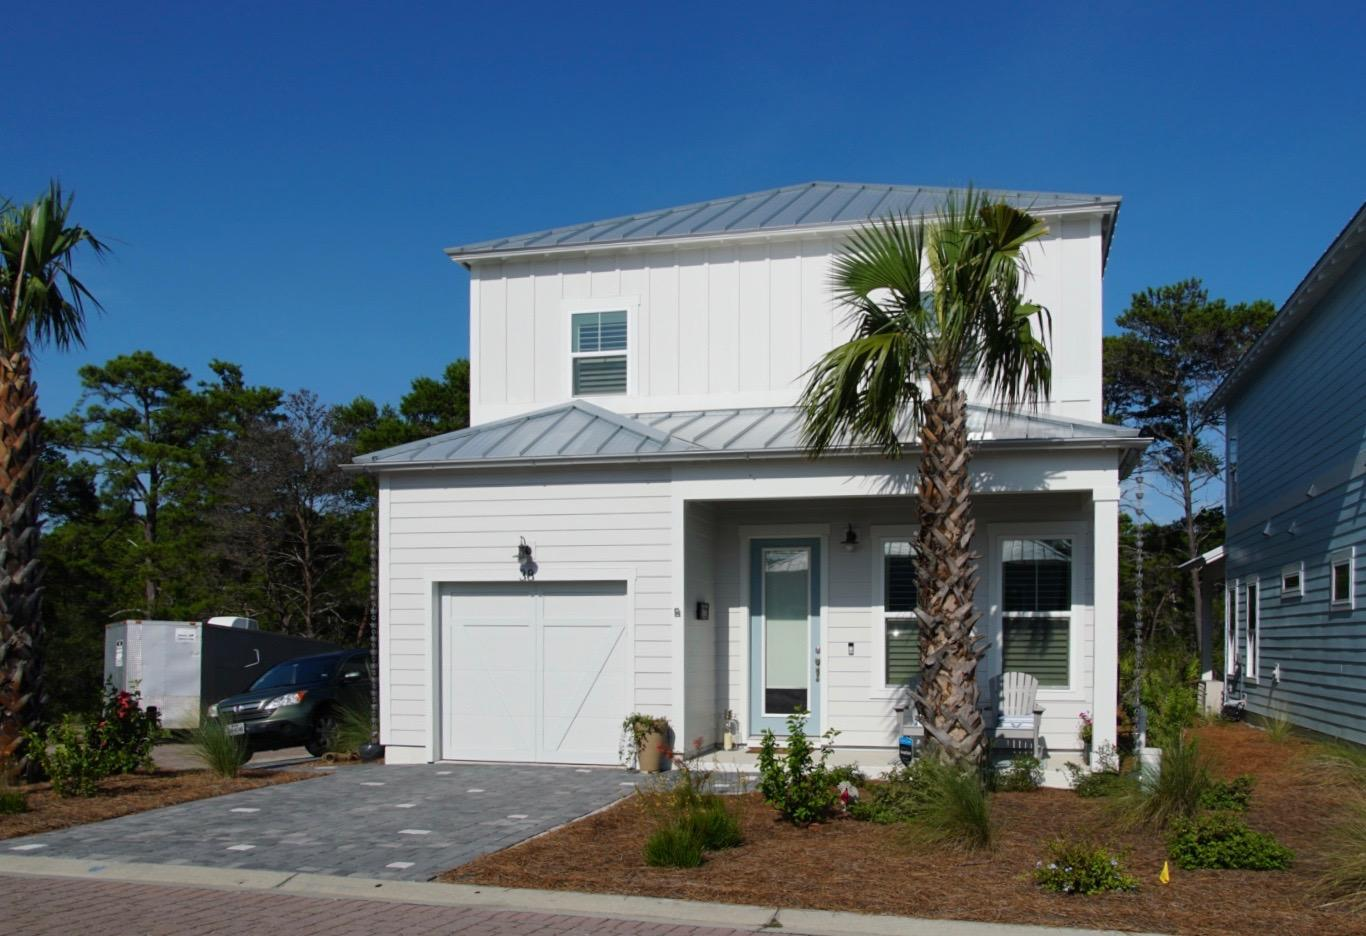 Lot 67 Constant Ave, Santa Rosa Beach, FL, 32459